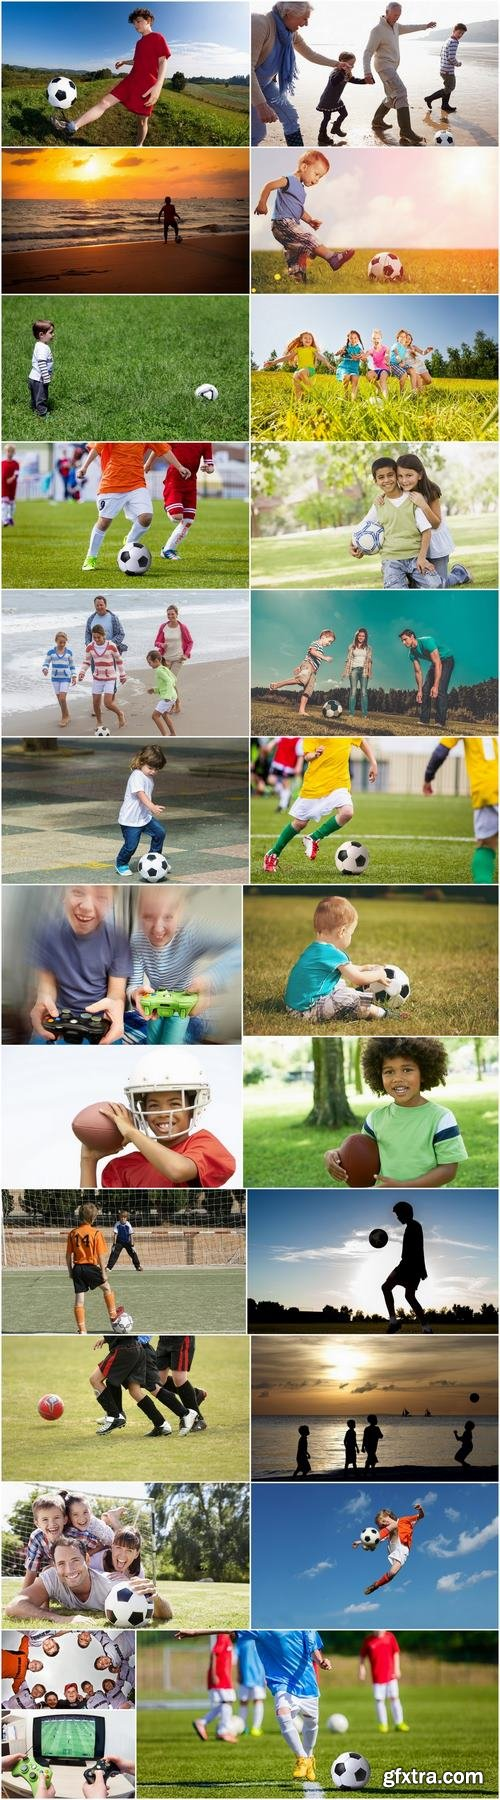 Child adolescent children playing football ball soccer field 25 HQ Jpeg